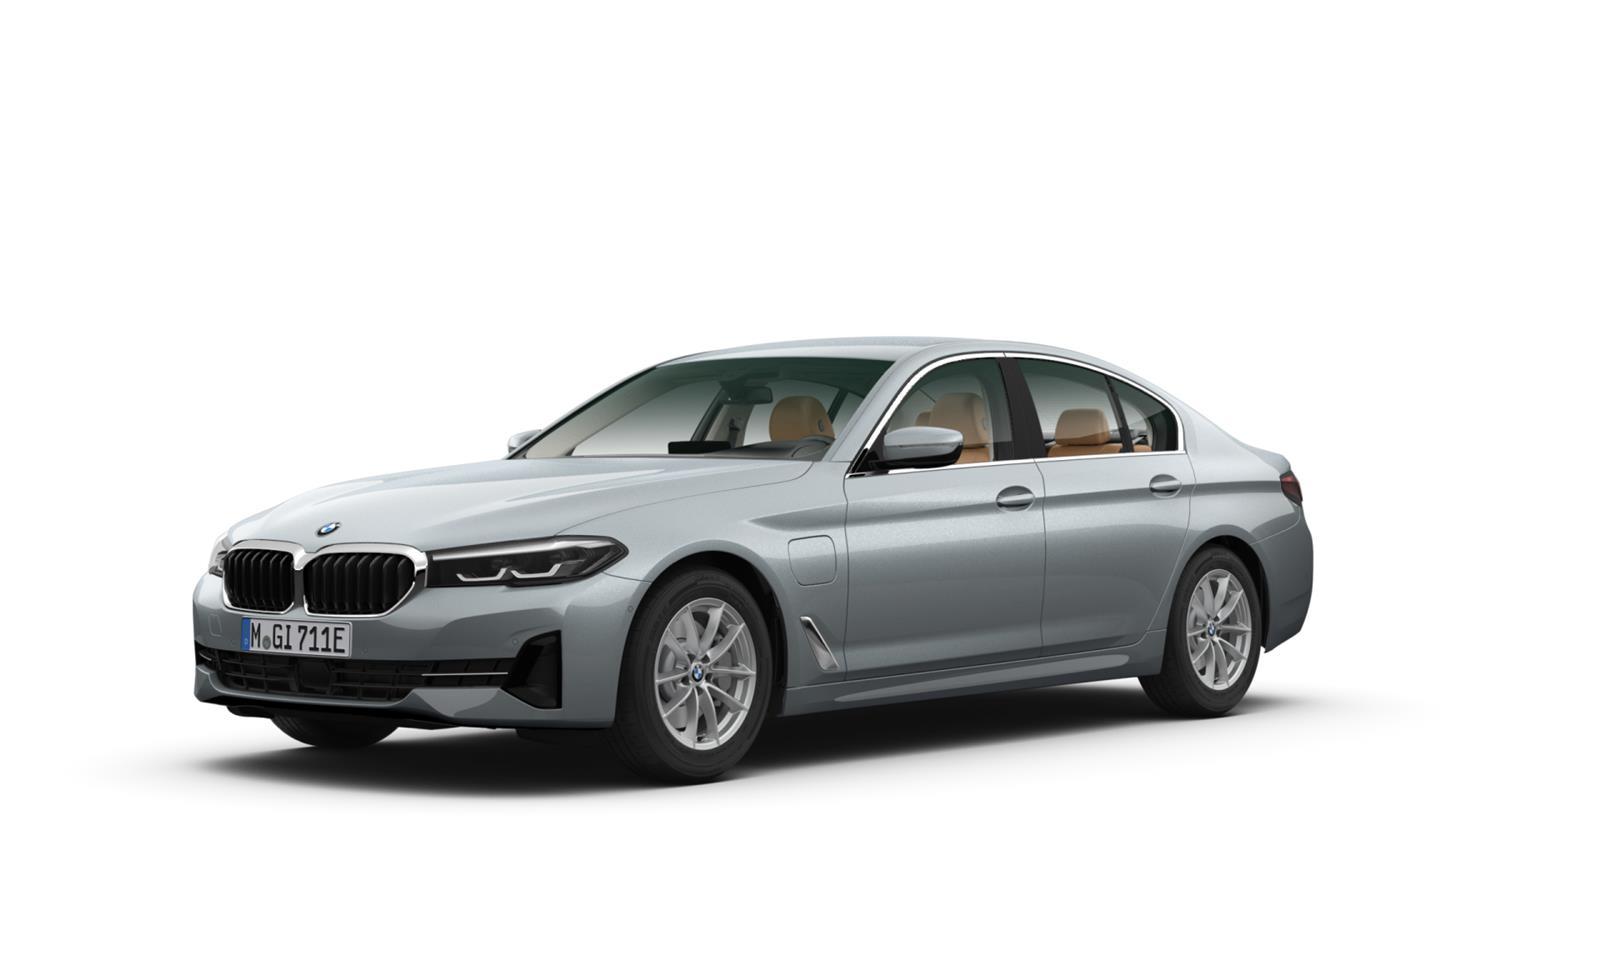 BMW 530 G30 Sedan 530e xDrive A Charged Edition